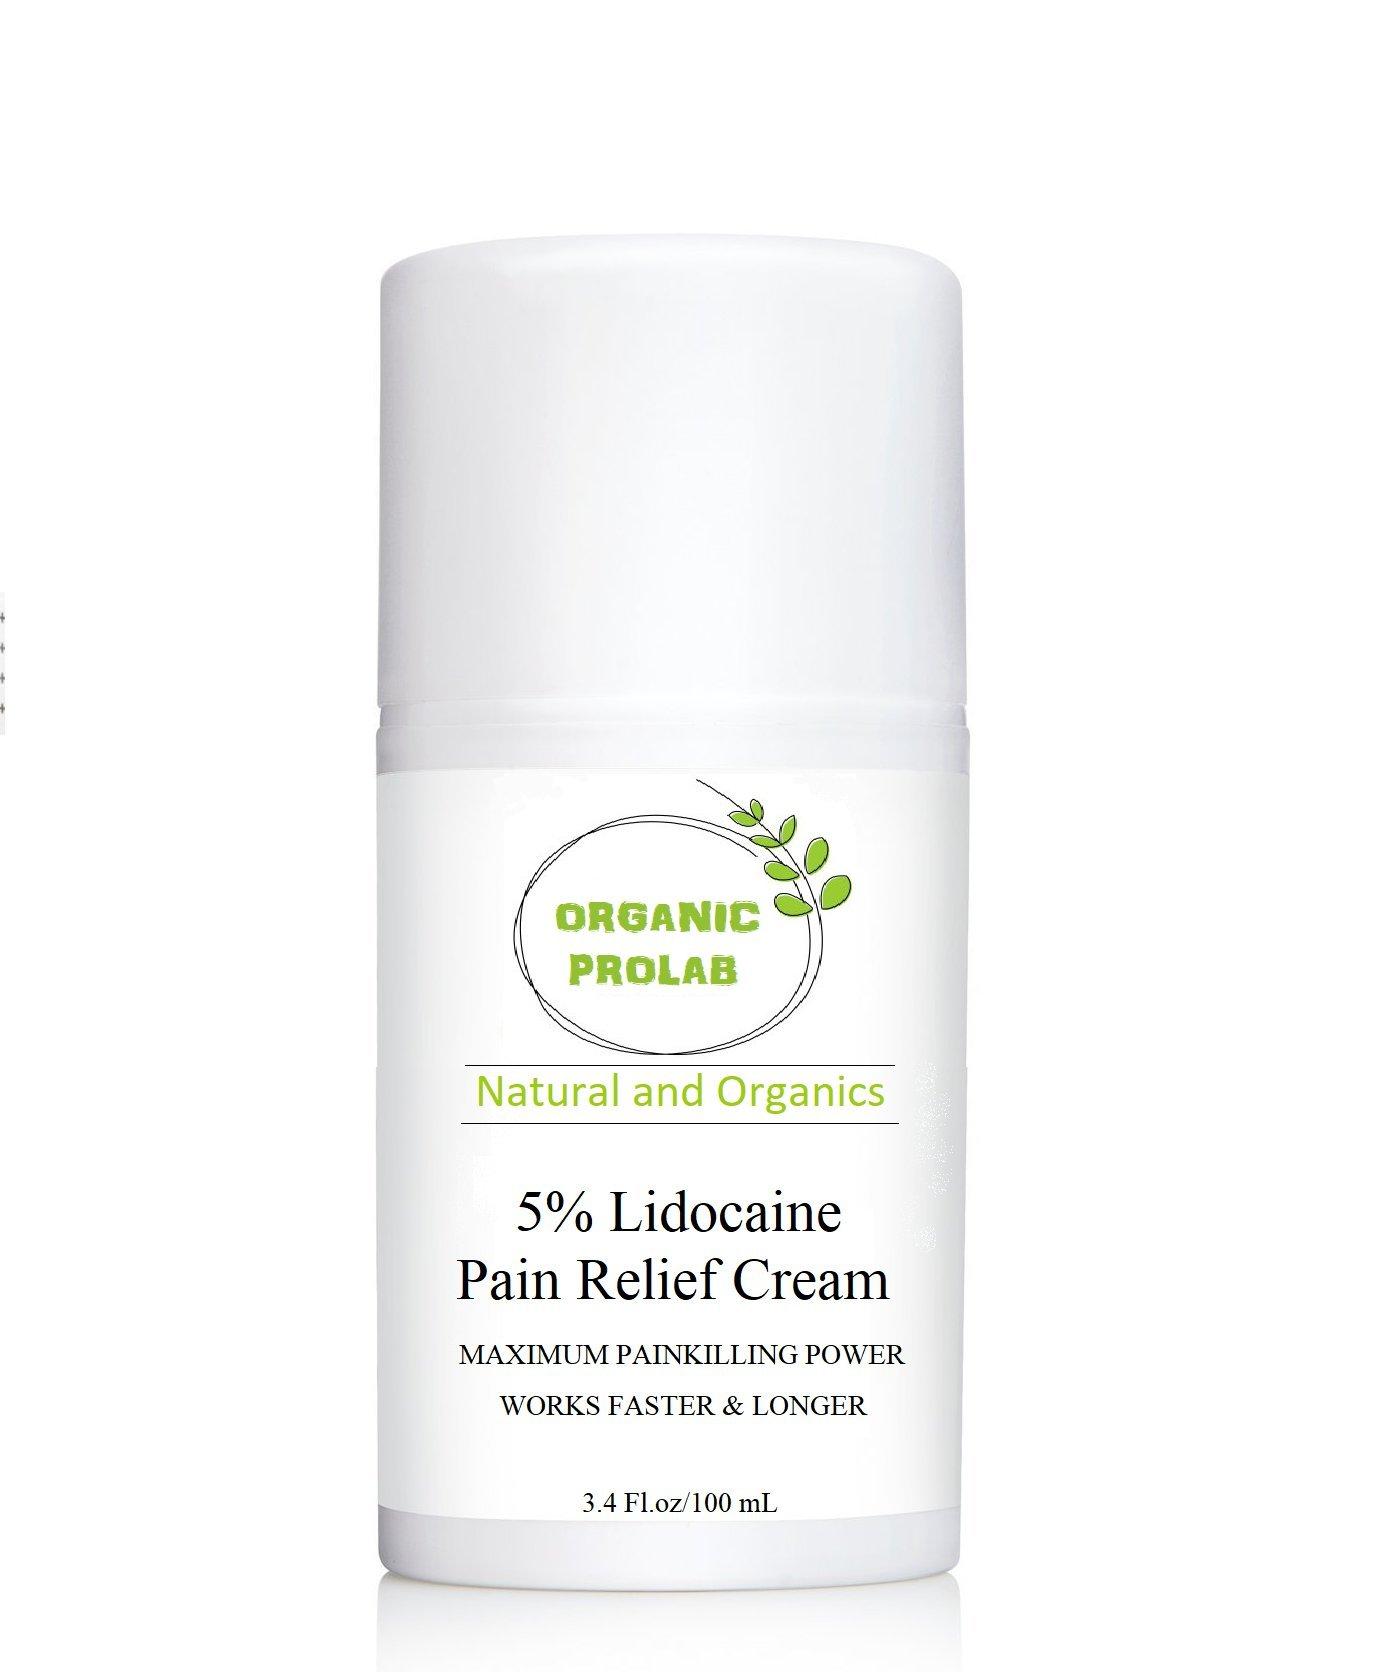 ORGANICPROLAB, 5% Lidocaine Pain Relief Cream, 3.4 Fl.oz/100mL